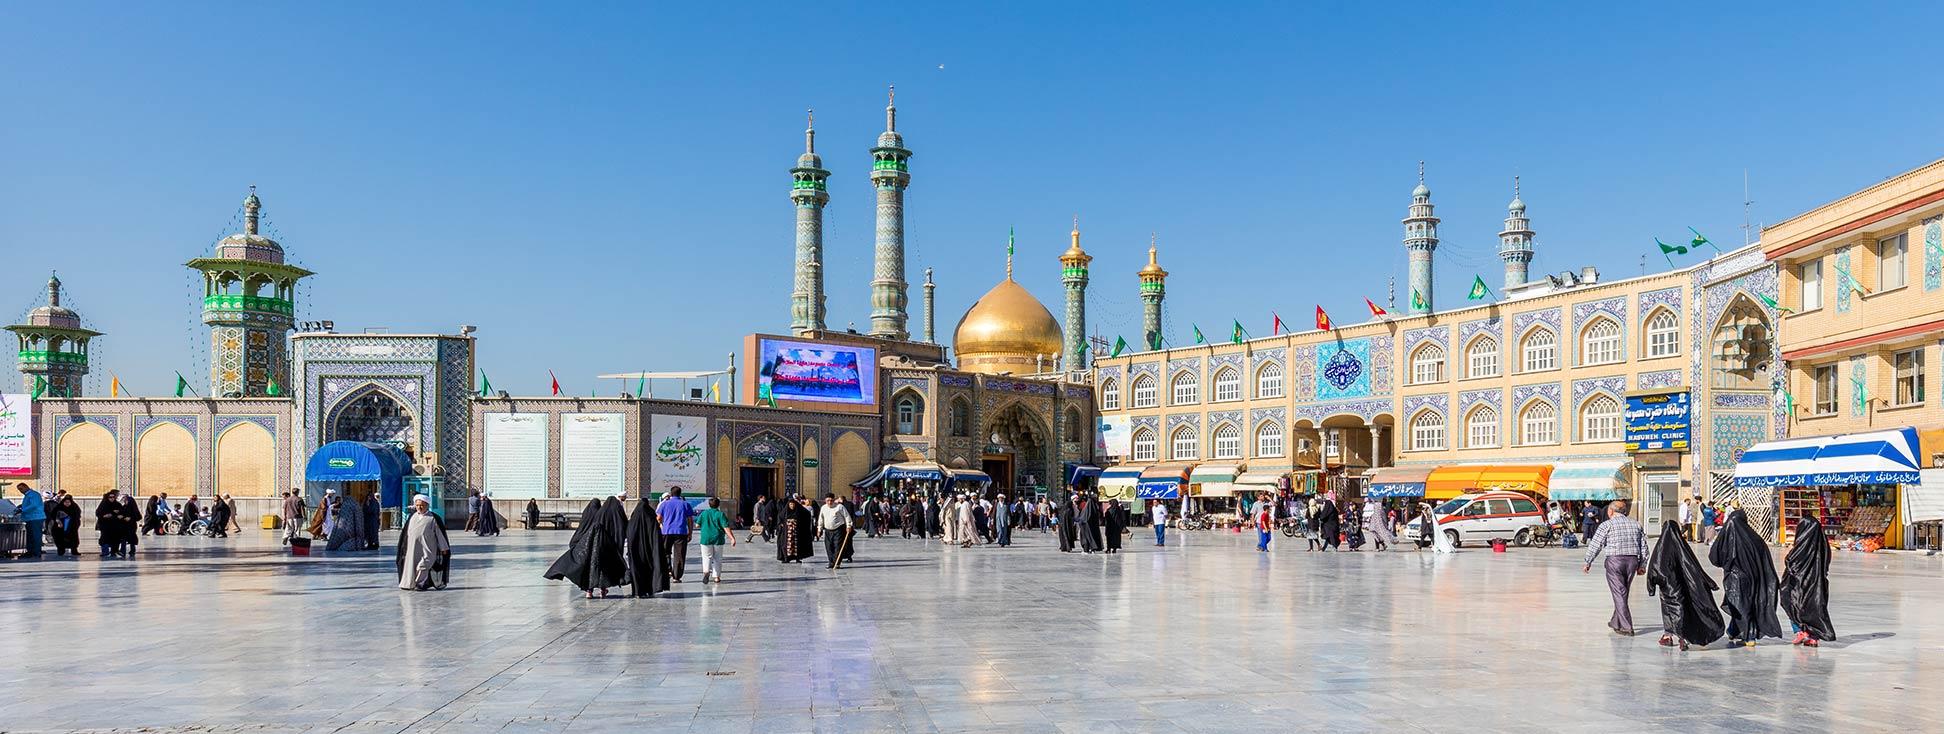 The Fatima Masumeh Shrine in the city of Qom in Iran